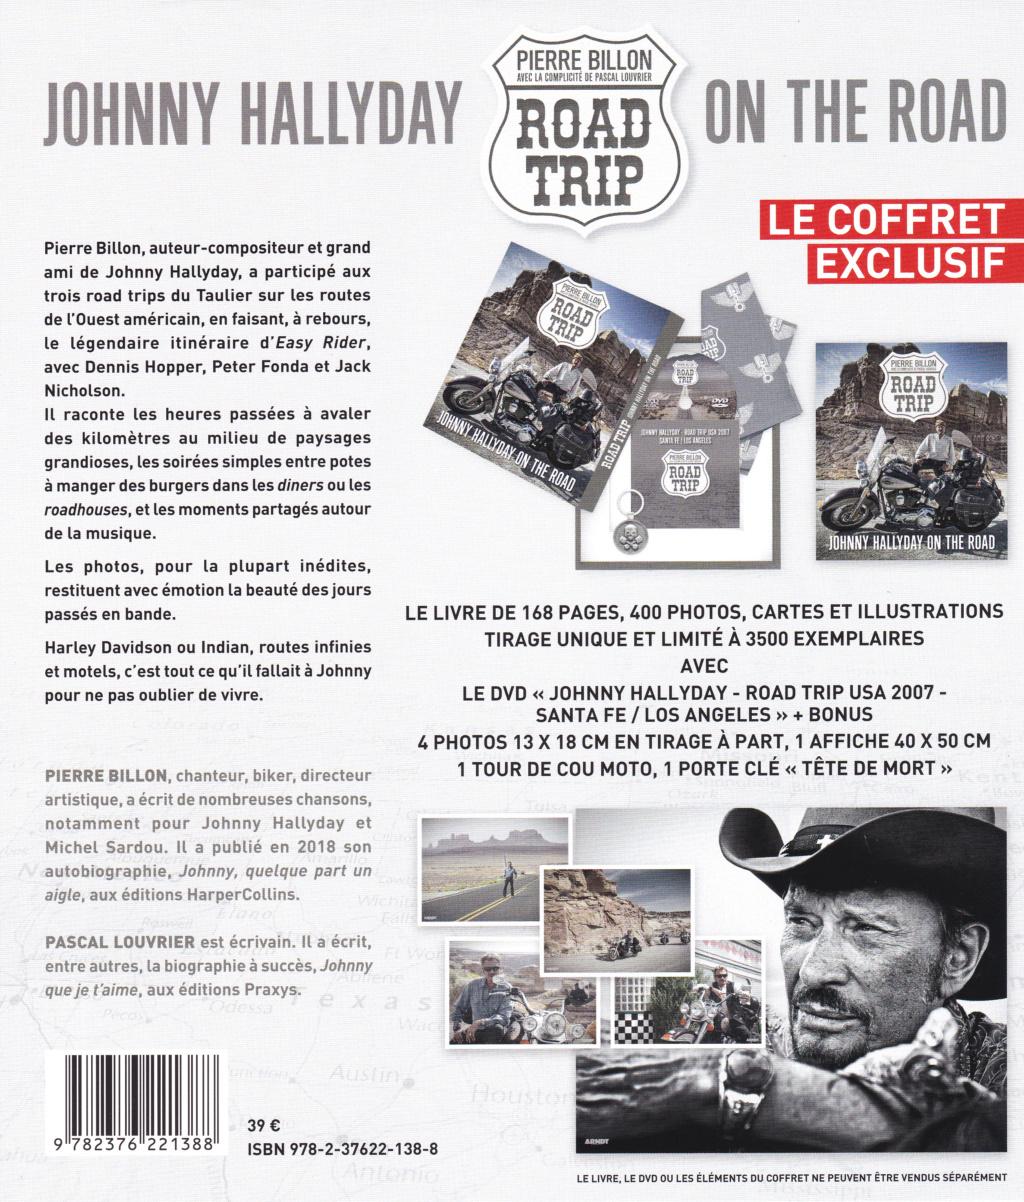 JAQUETTE DVD EMISSIONS TV , DOCUMENTS ,COMPILATIONS , ETC ( Jaquette + Sticker ) Img_0023